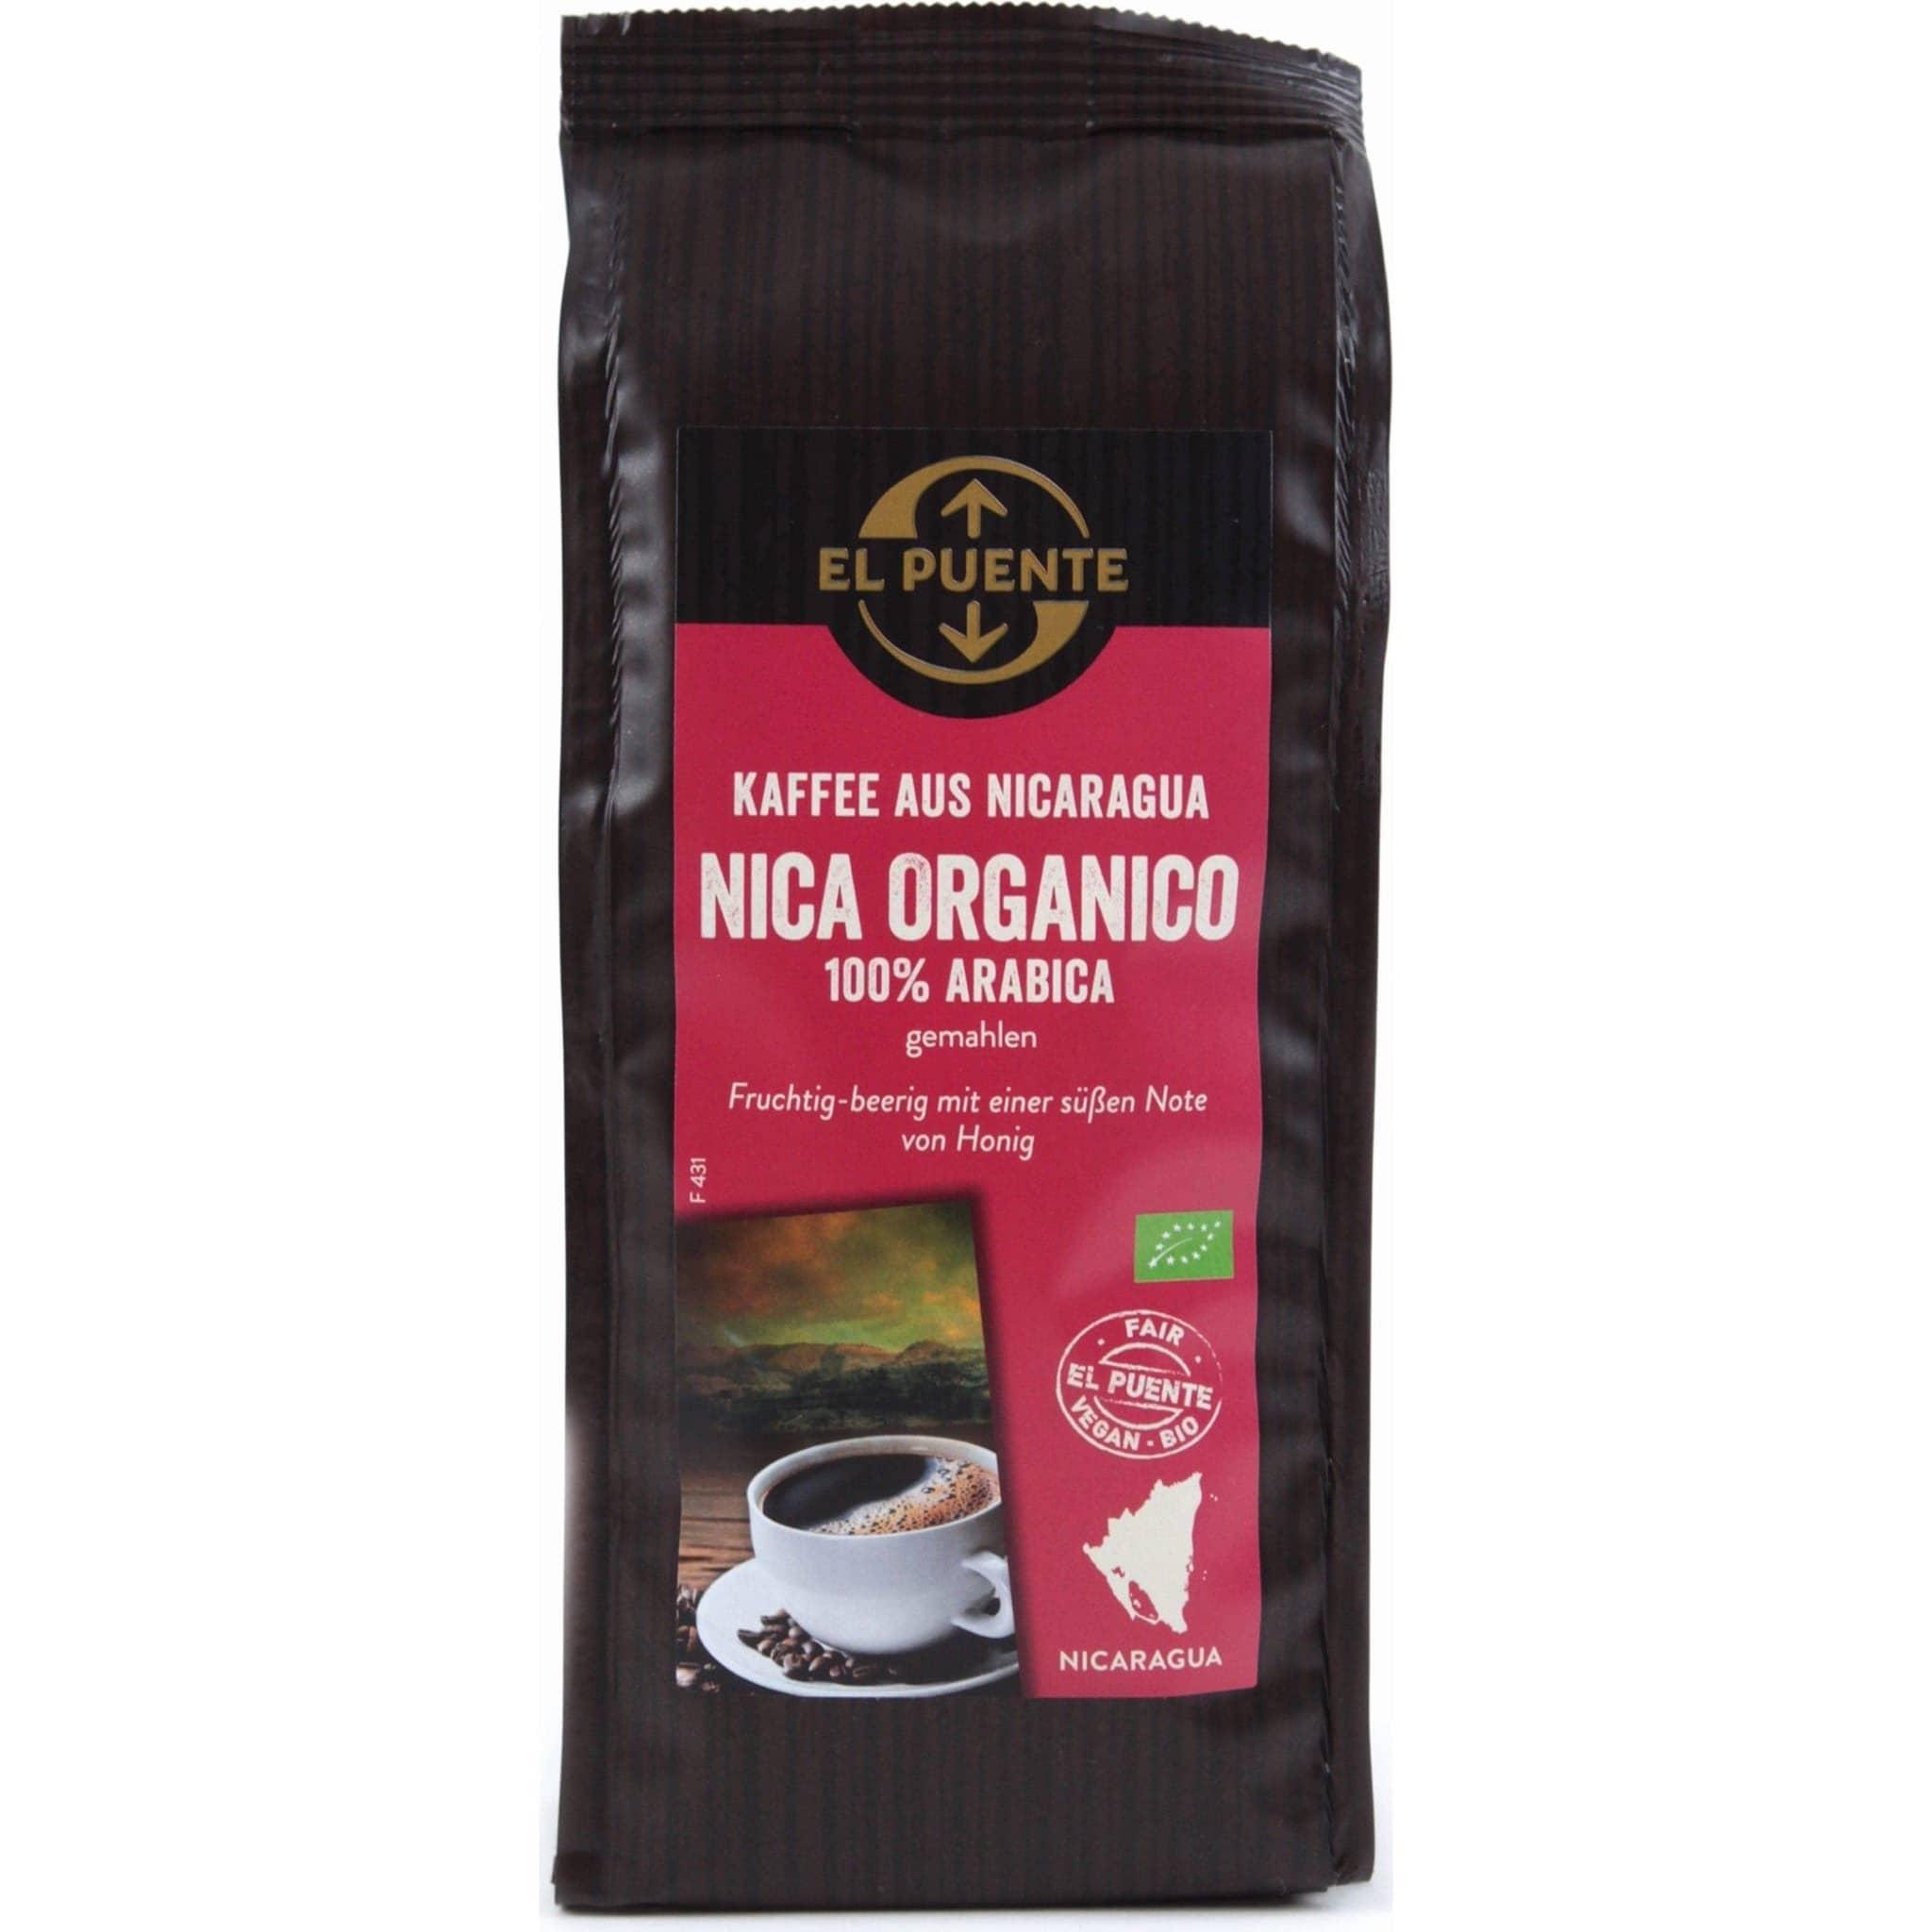 Nica Organica gemahlen 250g